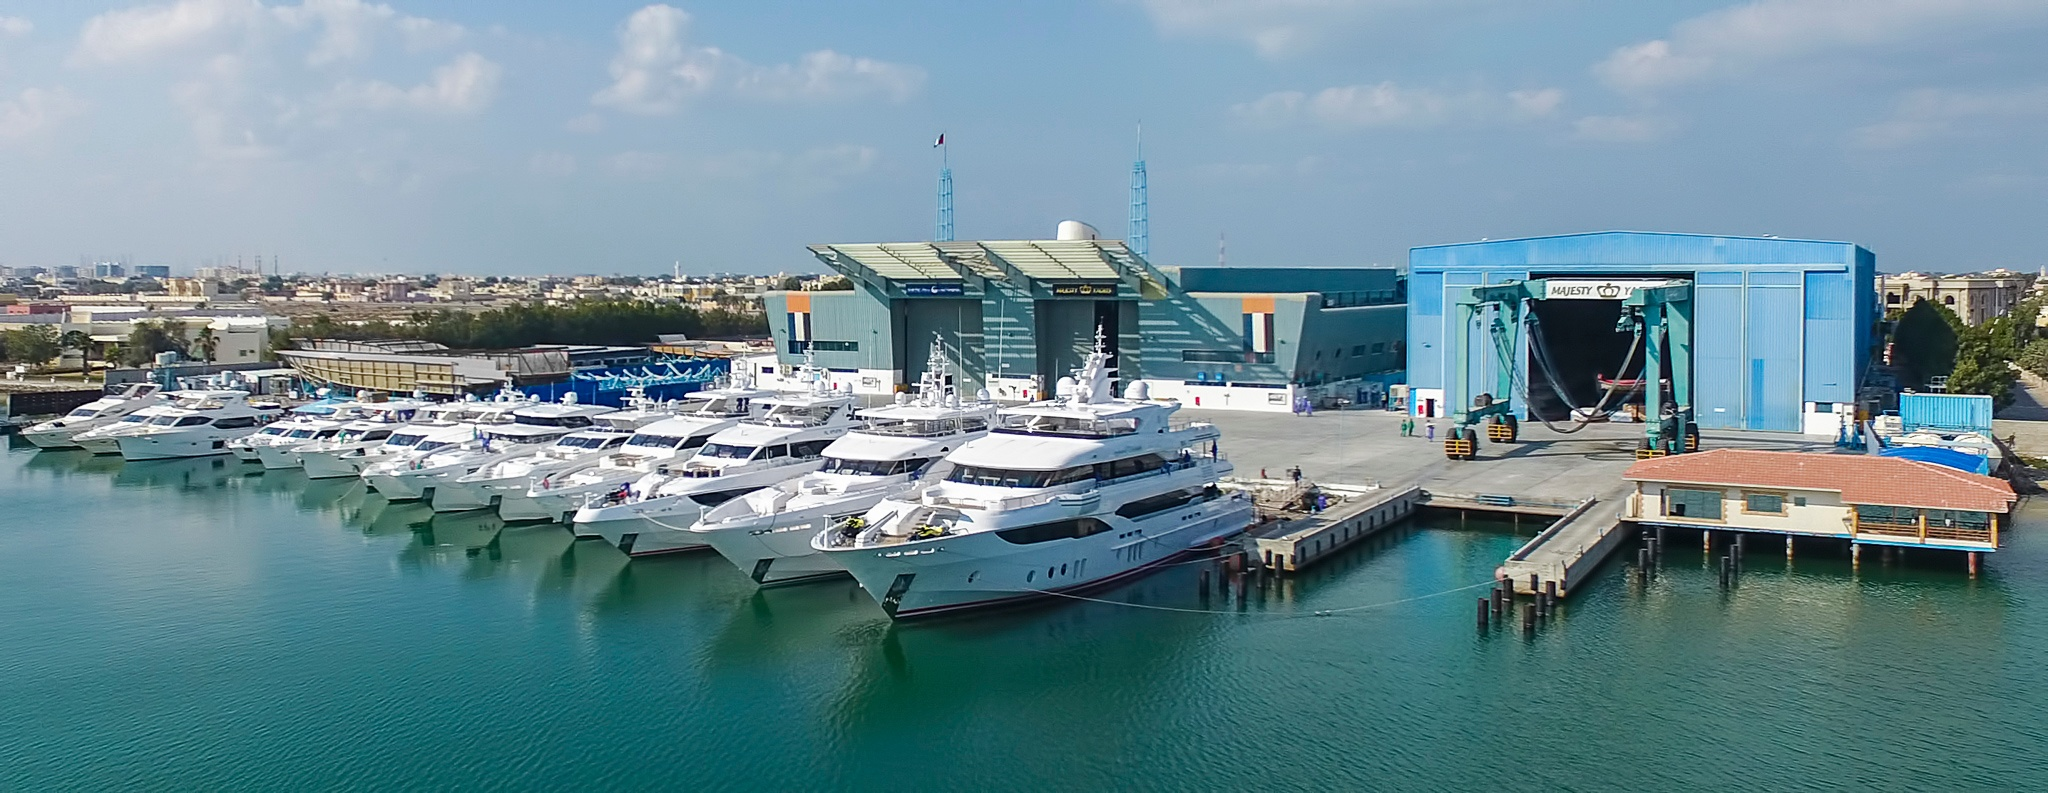 Gulf Craft Prepares its fleet for Dubai International Boat Show 2017 (4).jpg